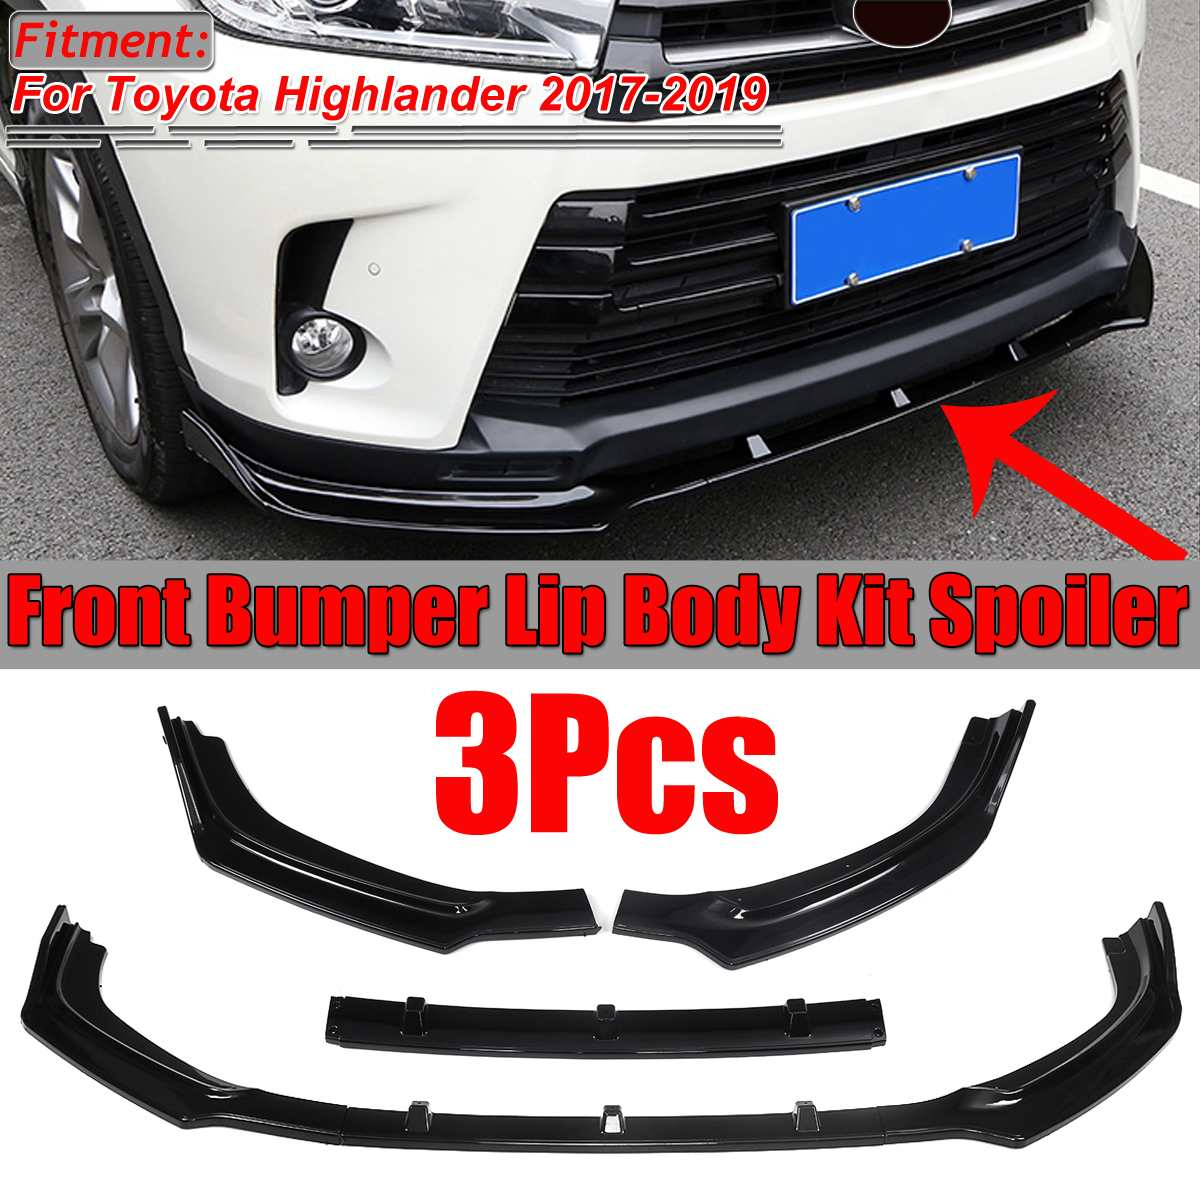 3pcs Bright black Front Bumper Lip Body Kit Spoiler For Honda Civic 2016-2018